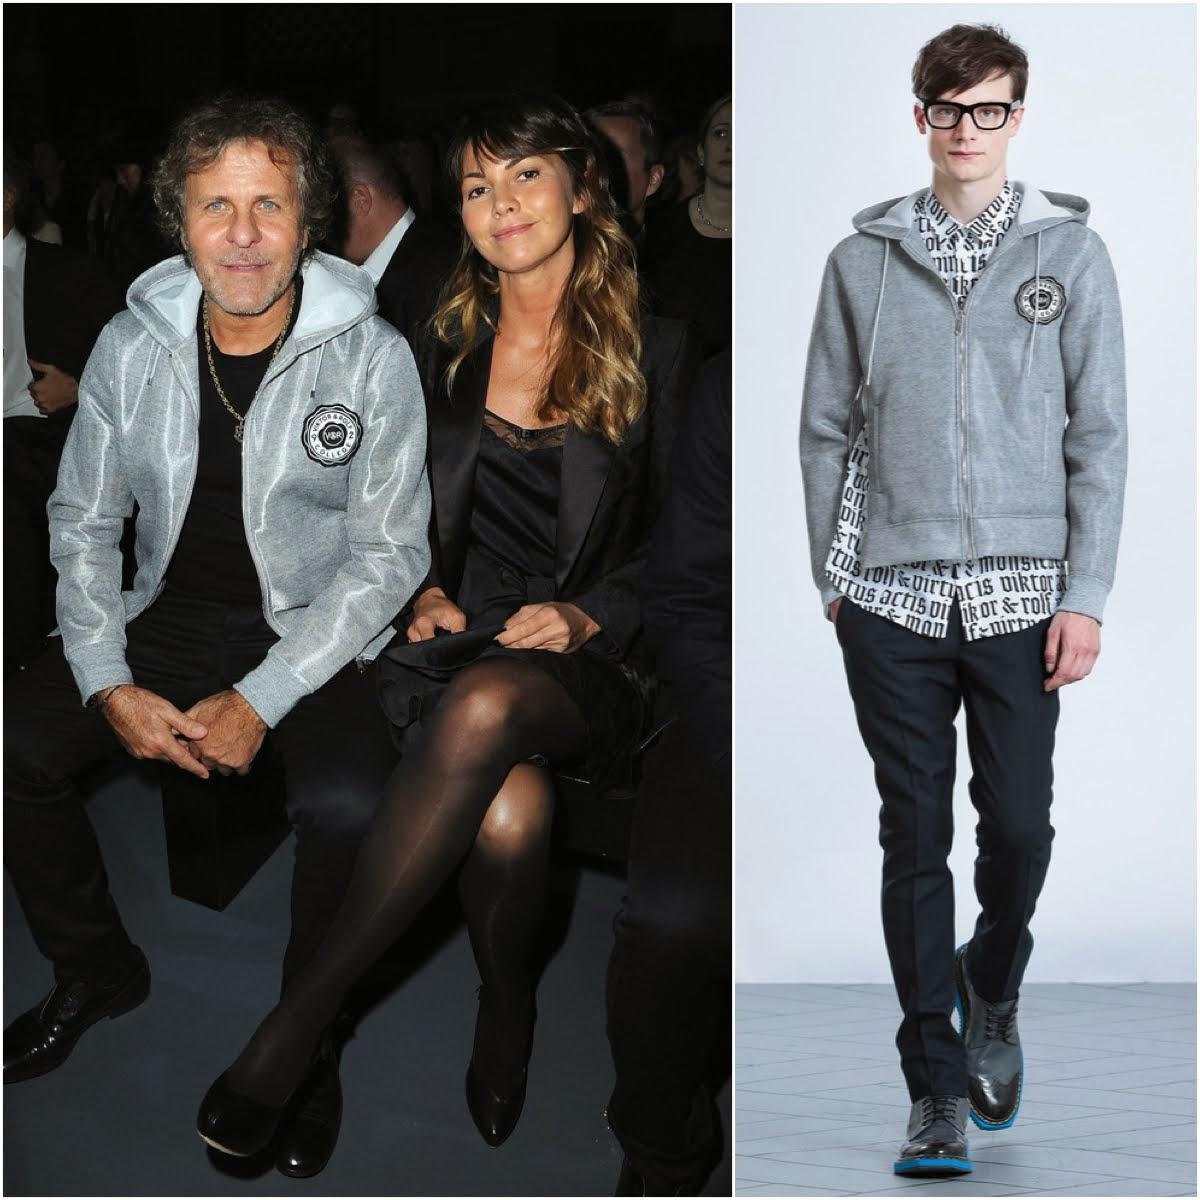 Renzo Rosso in Viktor & Rolf - Viktor & Rolf Haute Couture Spring Summer 2014 Show, #PFW